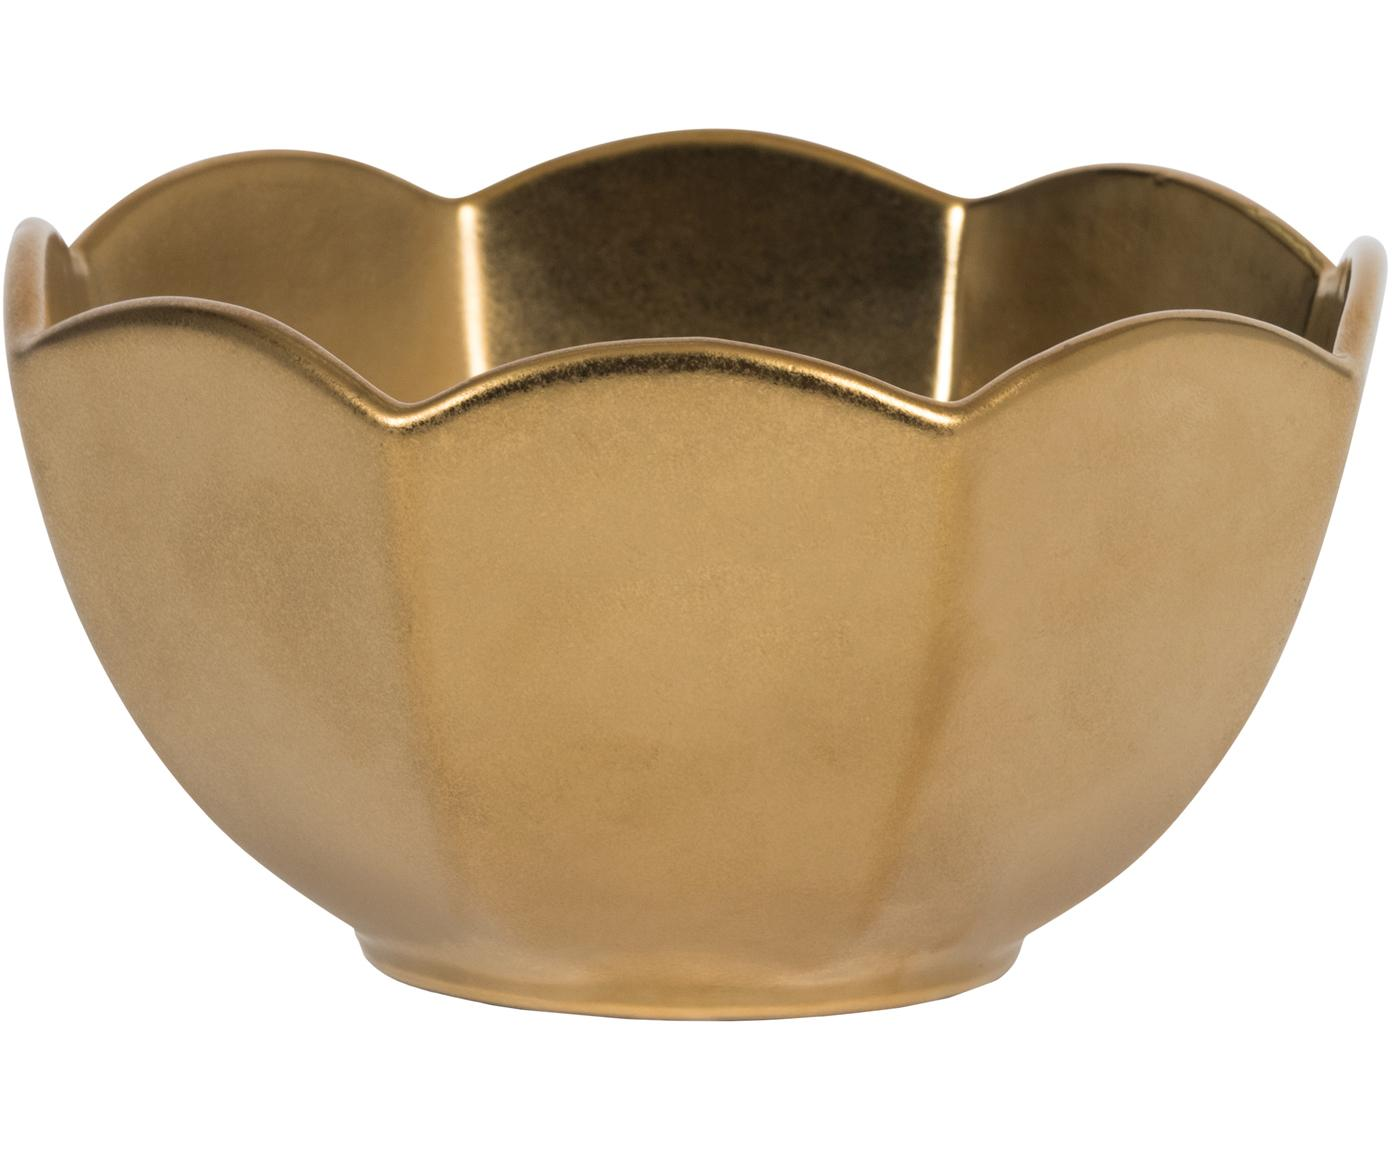 Ciotola fatta a mano oro opaco Ghabi, Terracotta, Dorato, Ø 13 x Alt. 8 cm